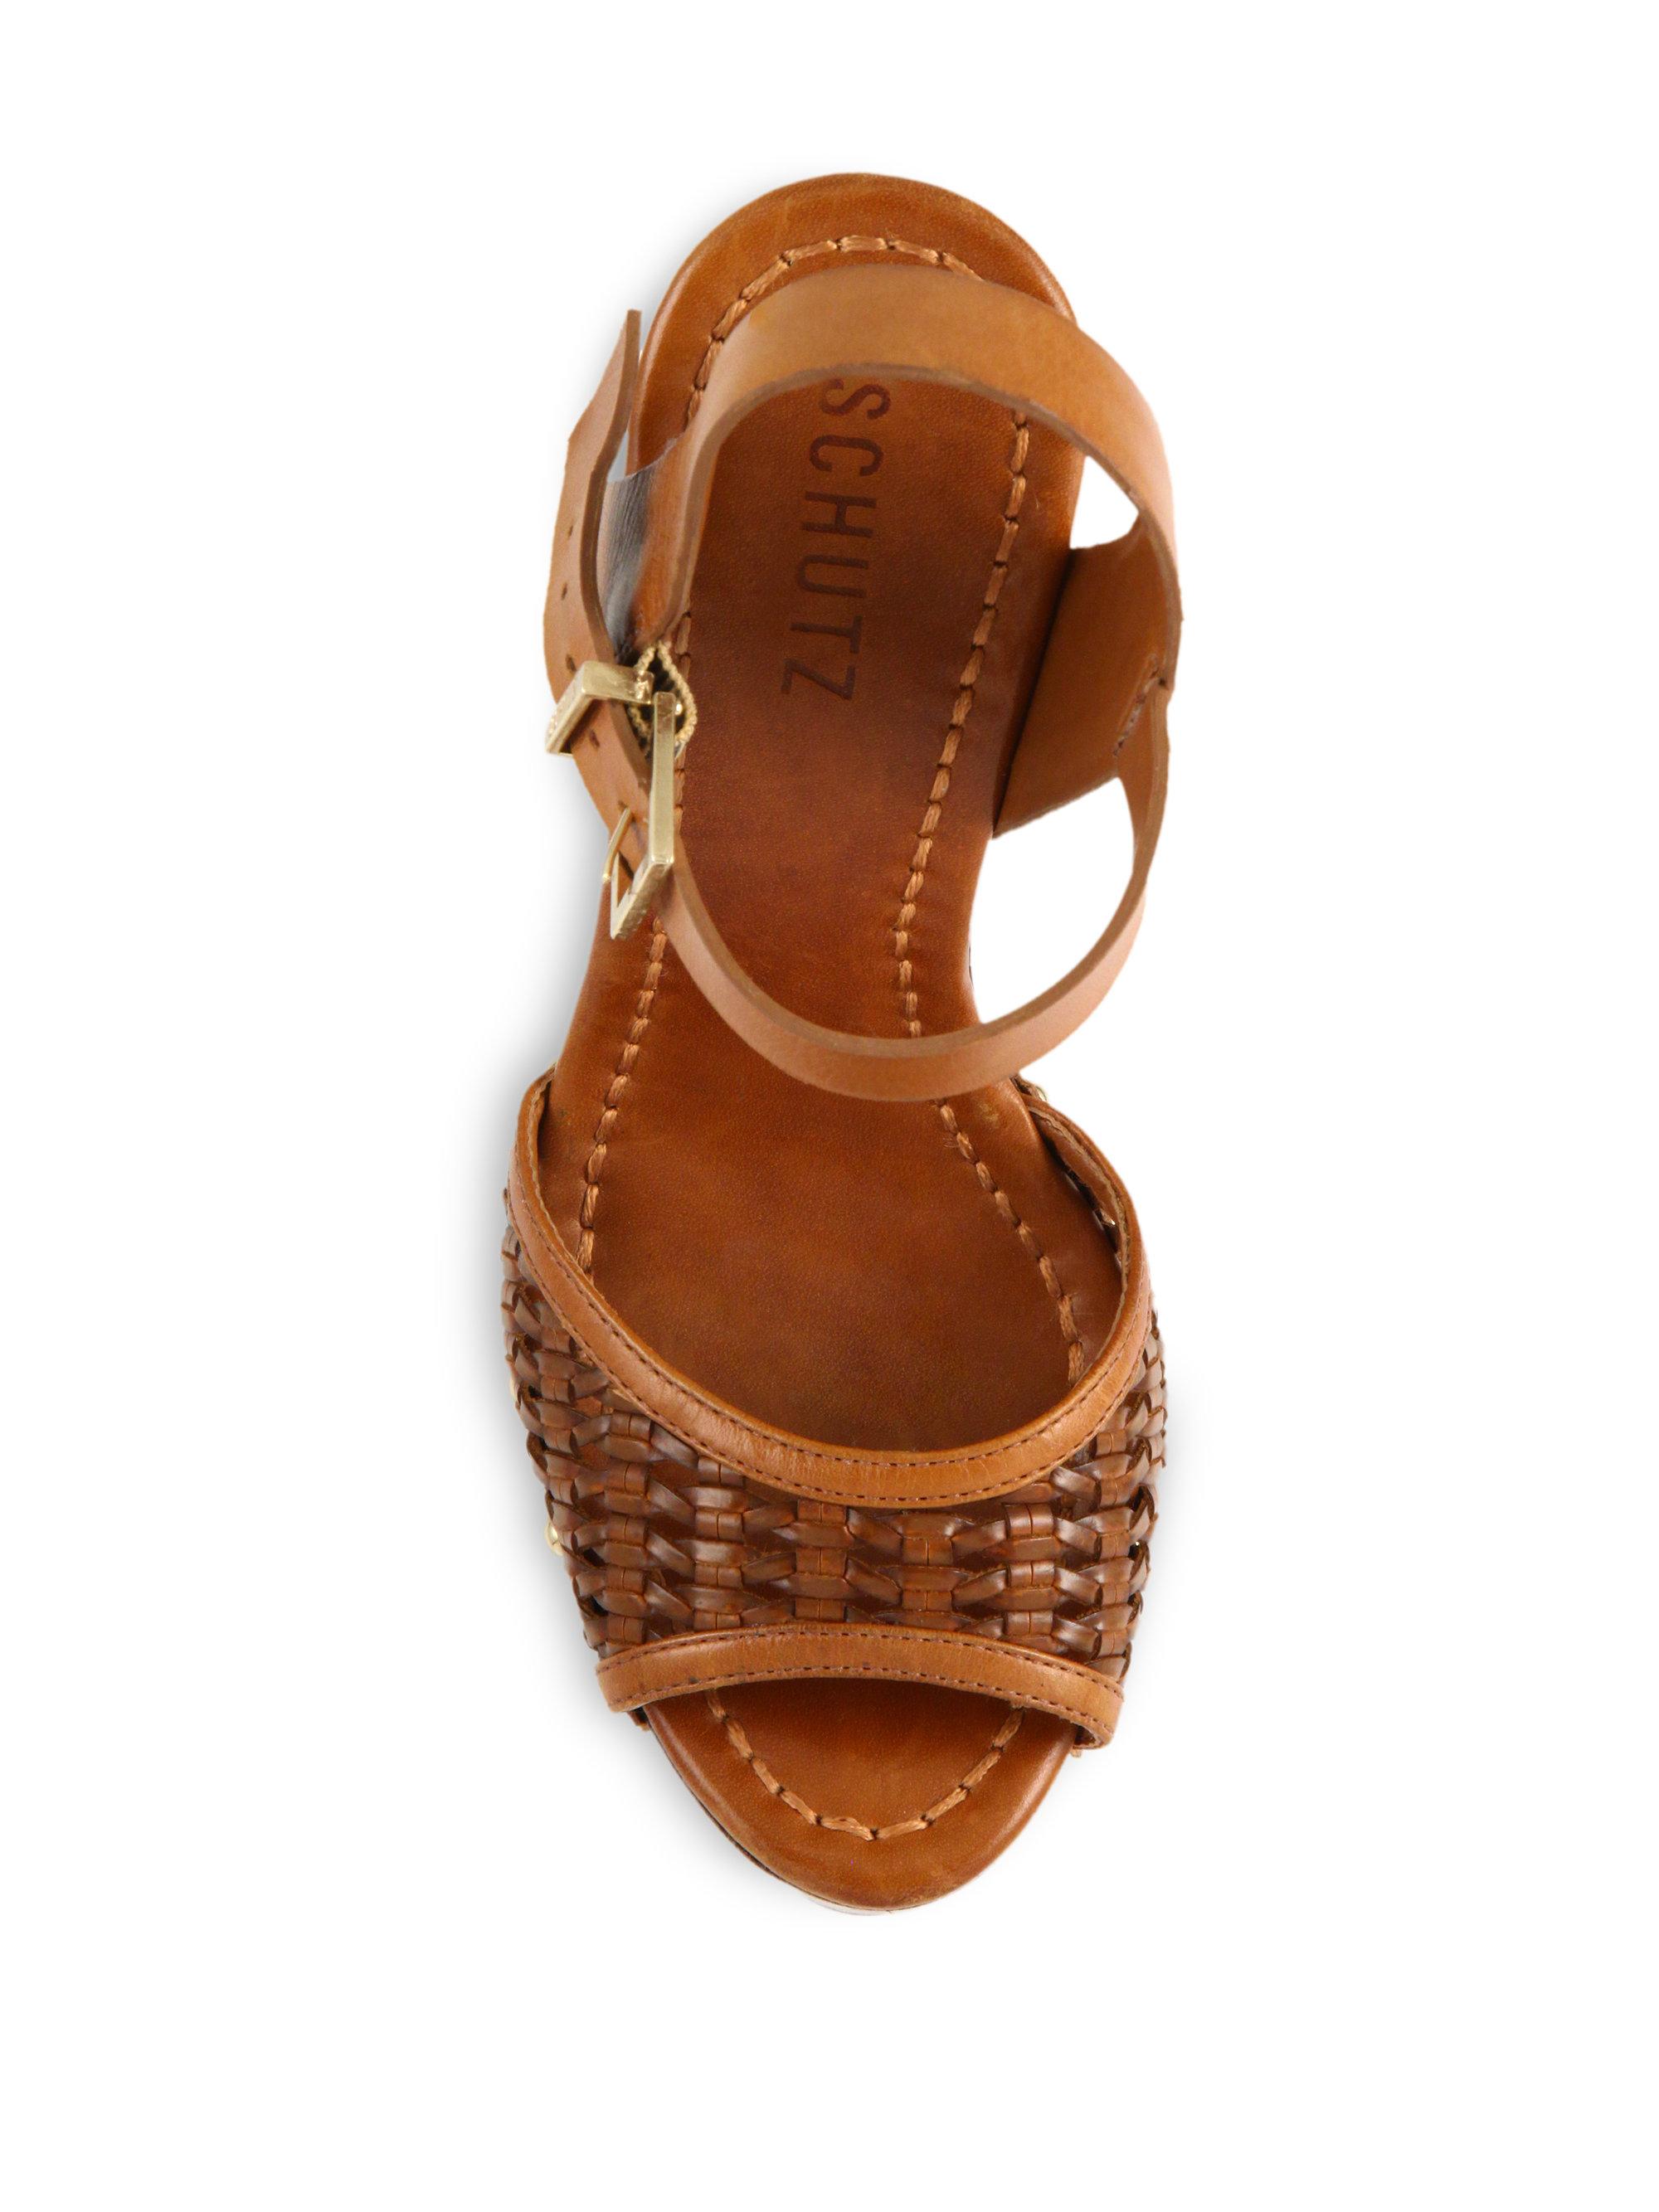 Schutz Janice Woven Leather Platform Sandals In Brown Lyst